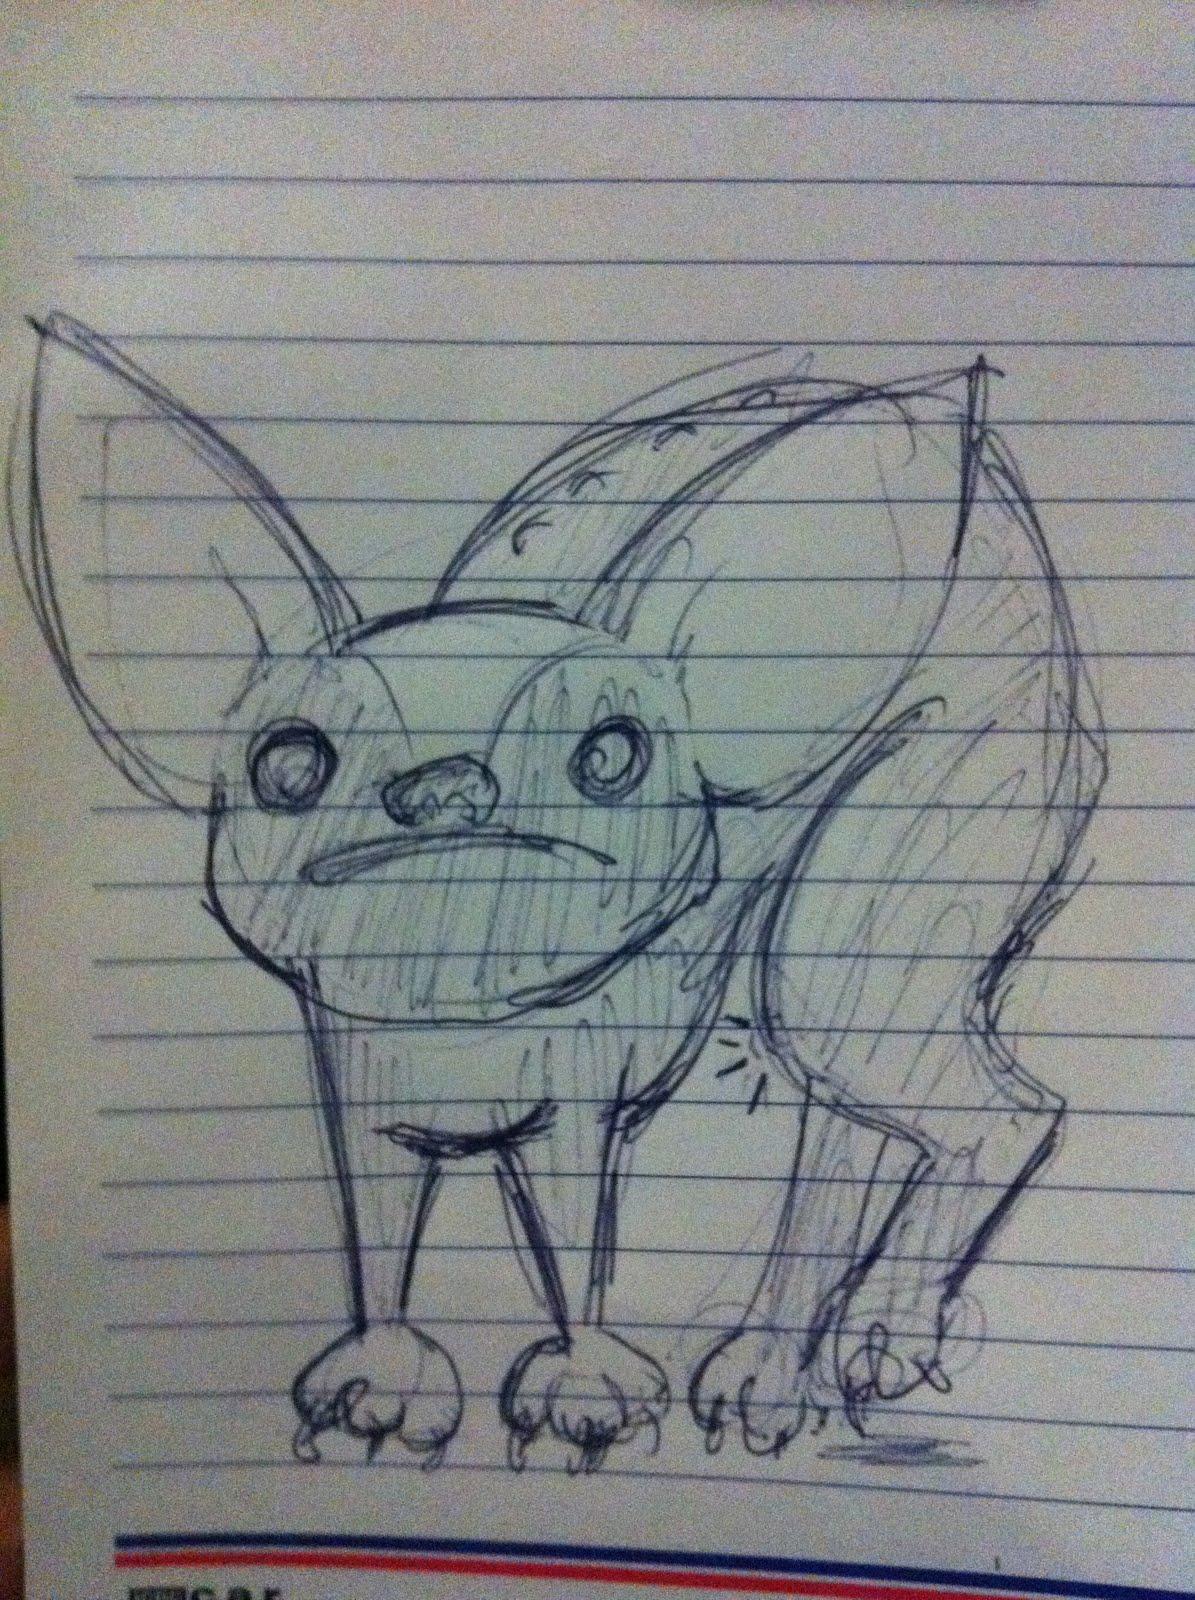 A Million Bad Drawings: Poor Hurley! Bad Drawing #86